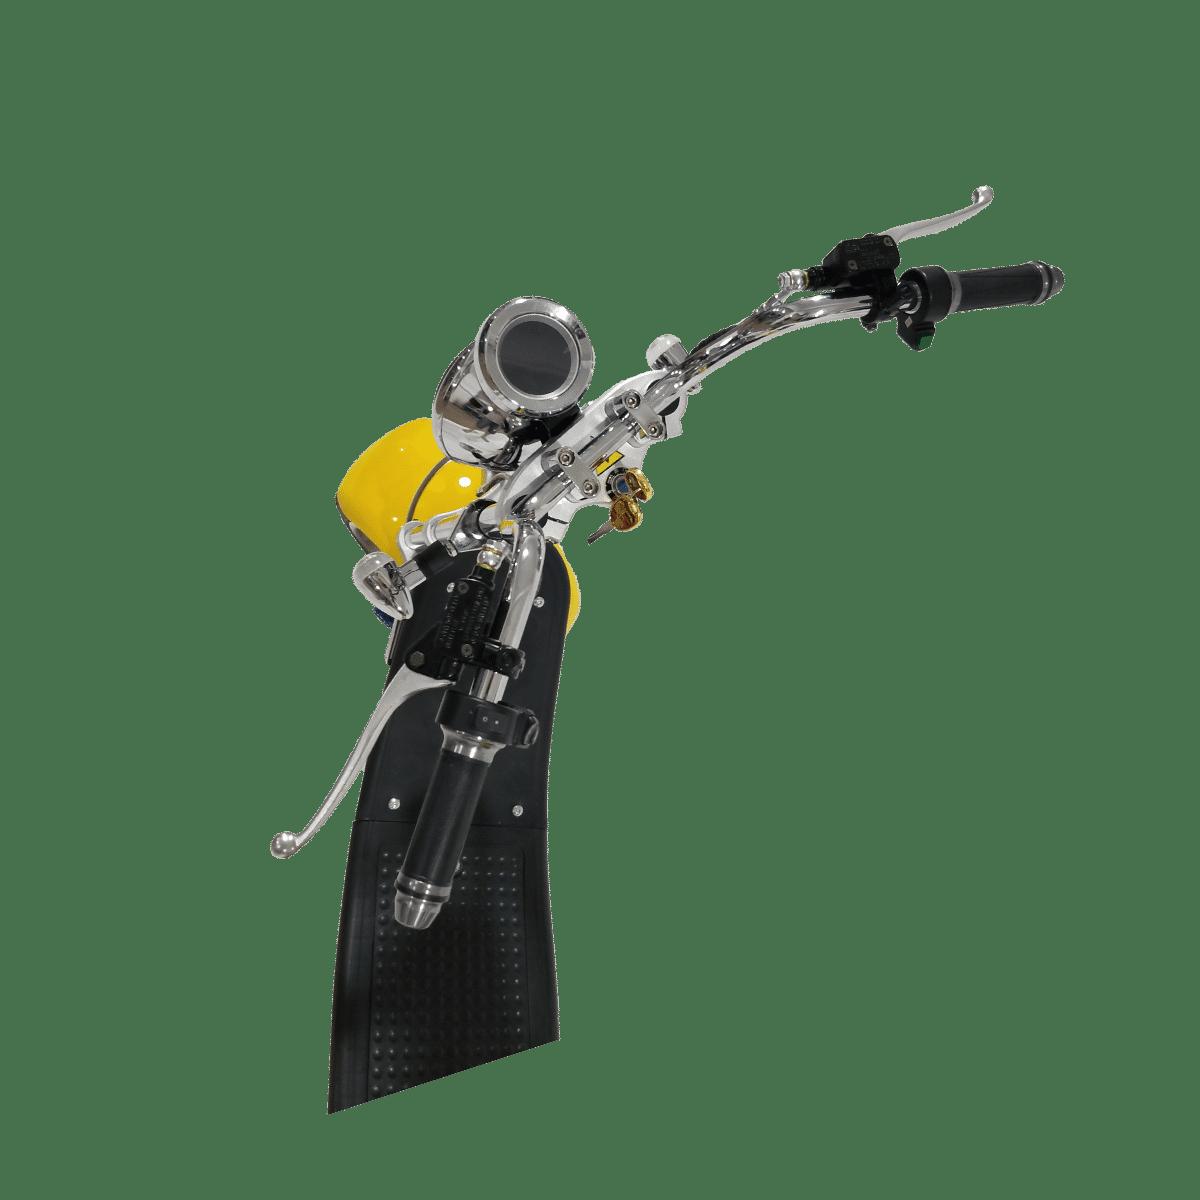 Citycoco Harley Deluxe Jaune avec 1 batterie offerte en plus 15